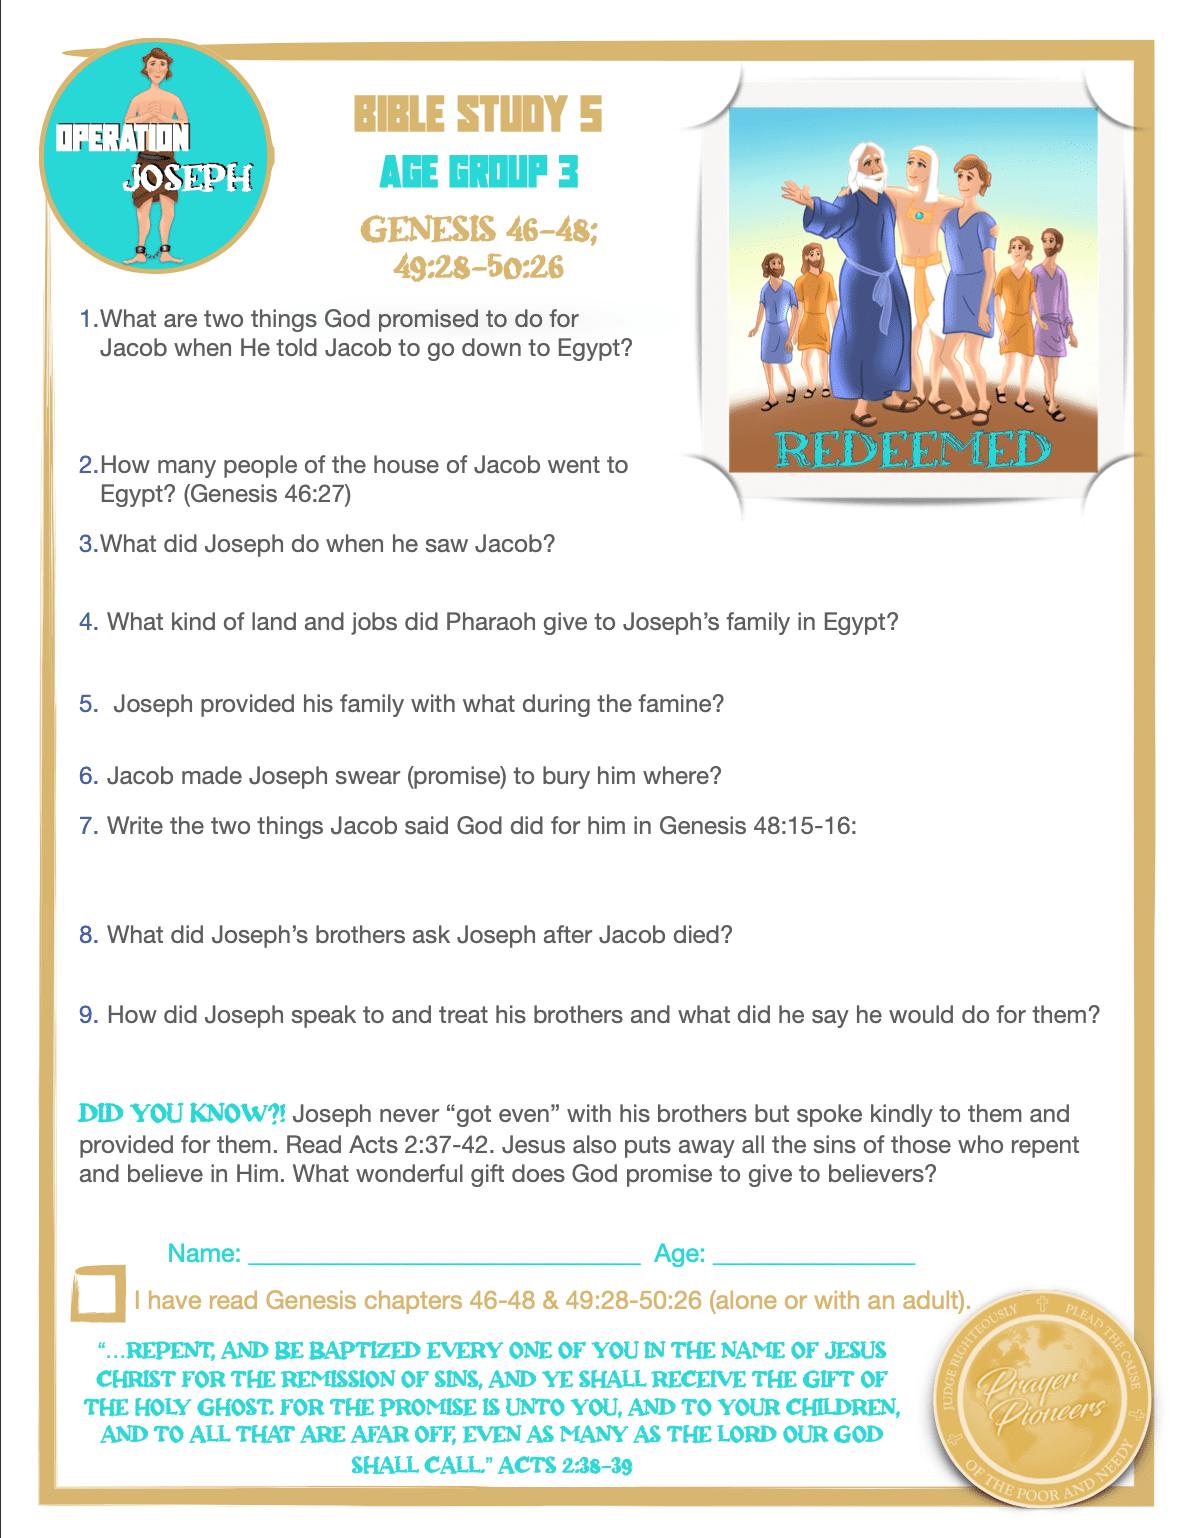 OJ - Study 5 - Age Group 2